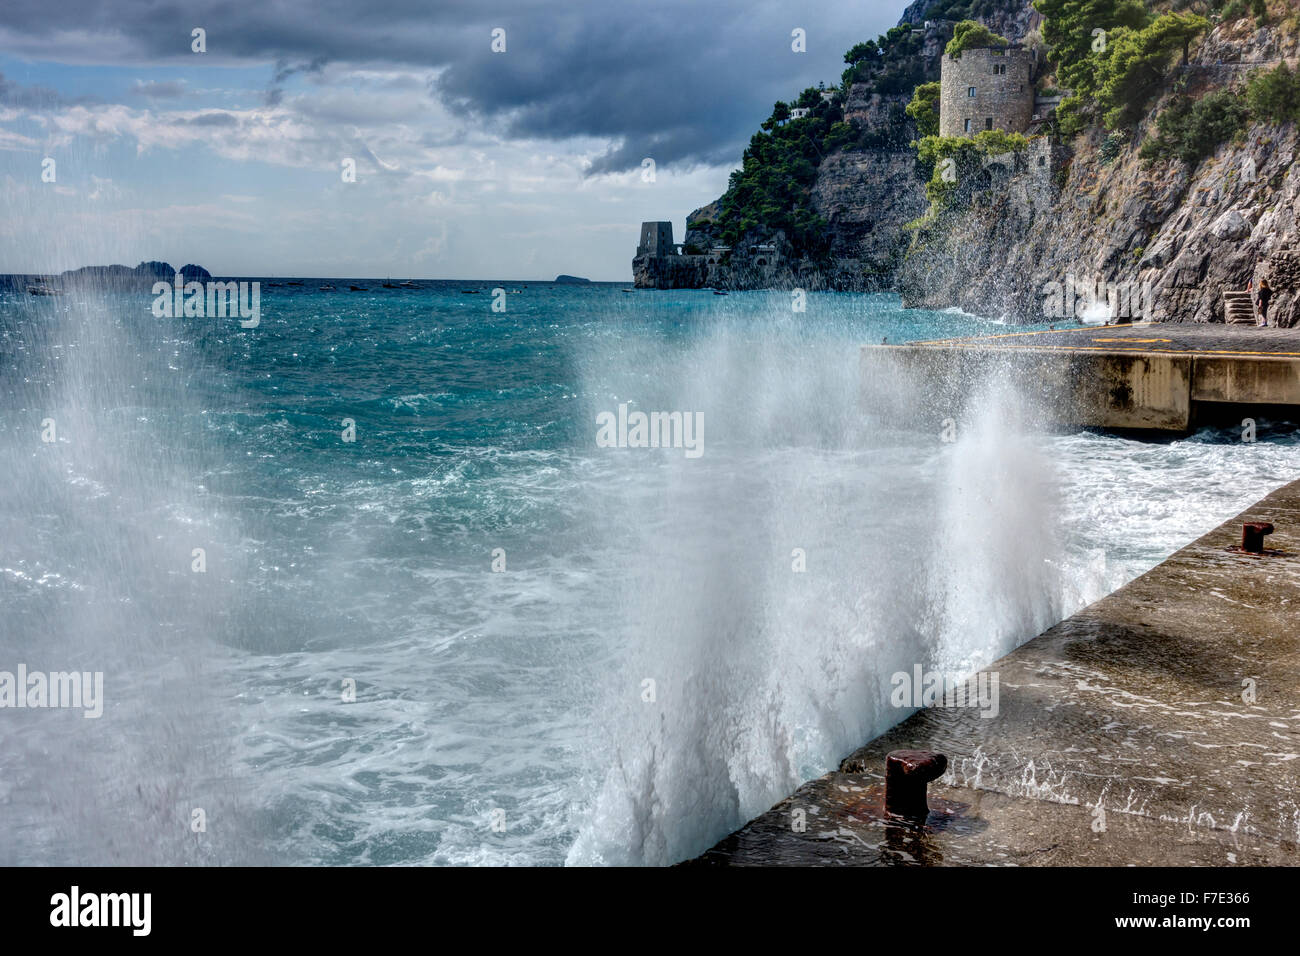 Positano, Amalfi Coast, Italy - Stock Image